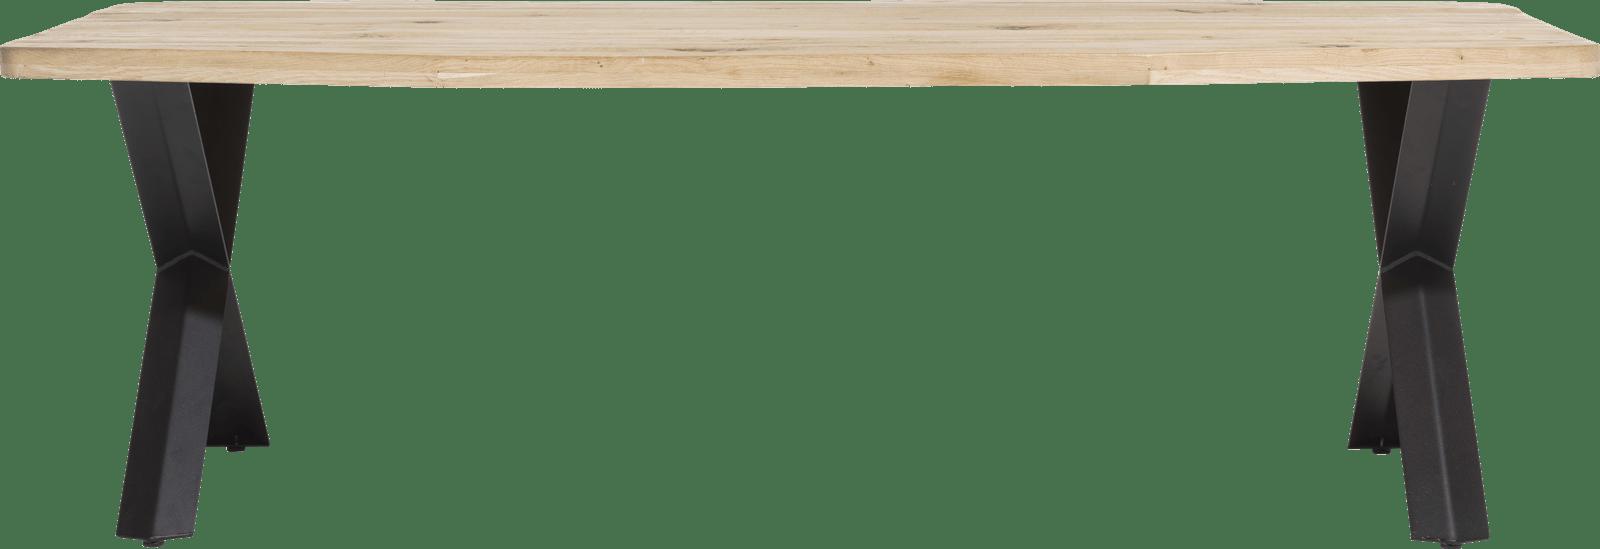 maddox table 250 x 100 cm bois pied forme x